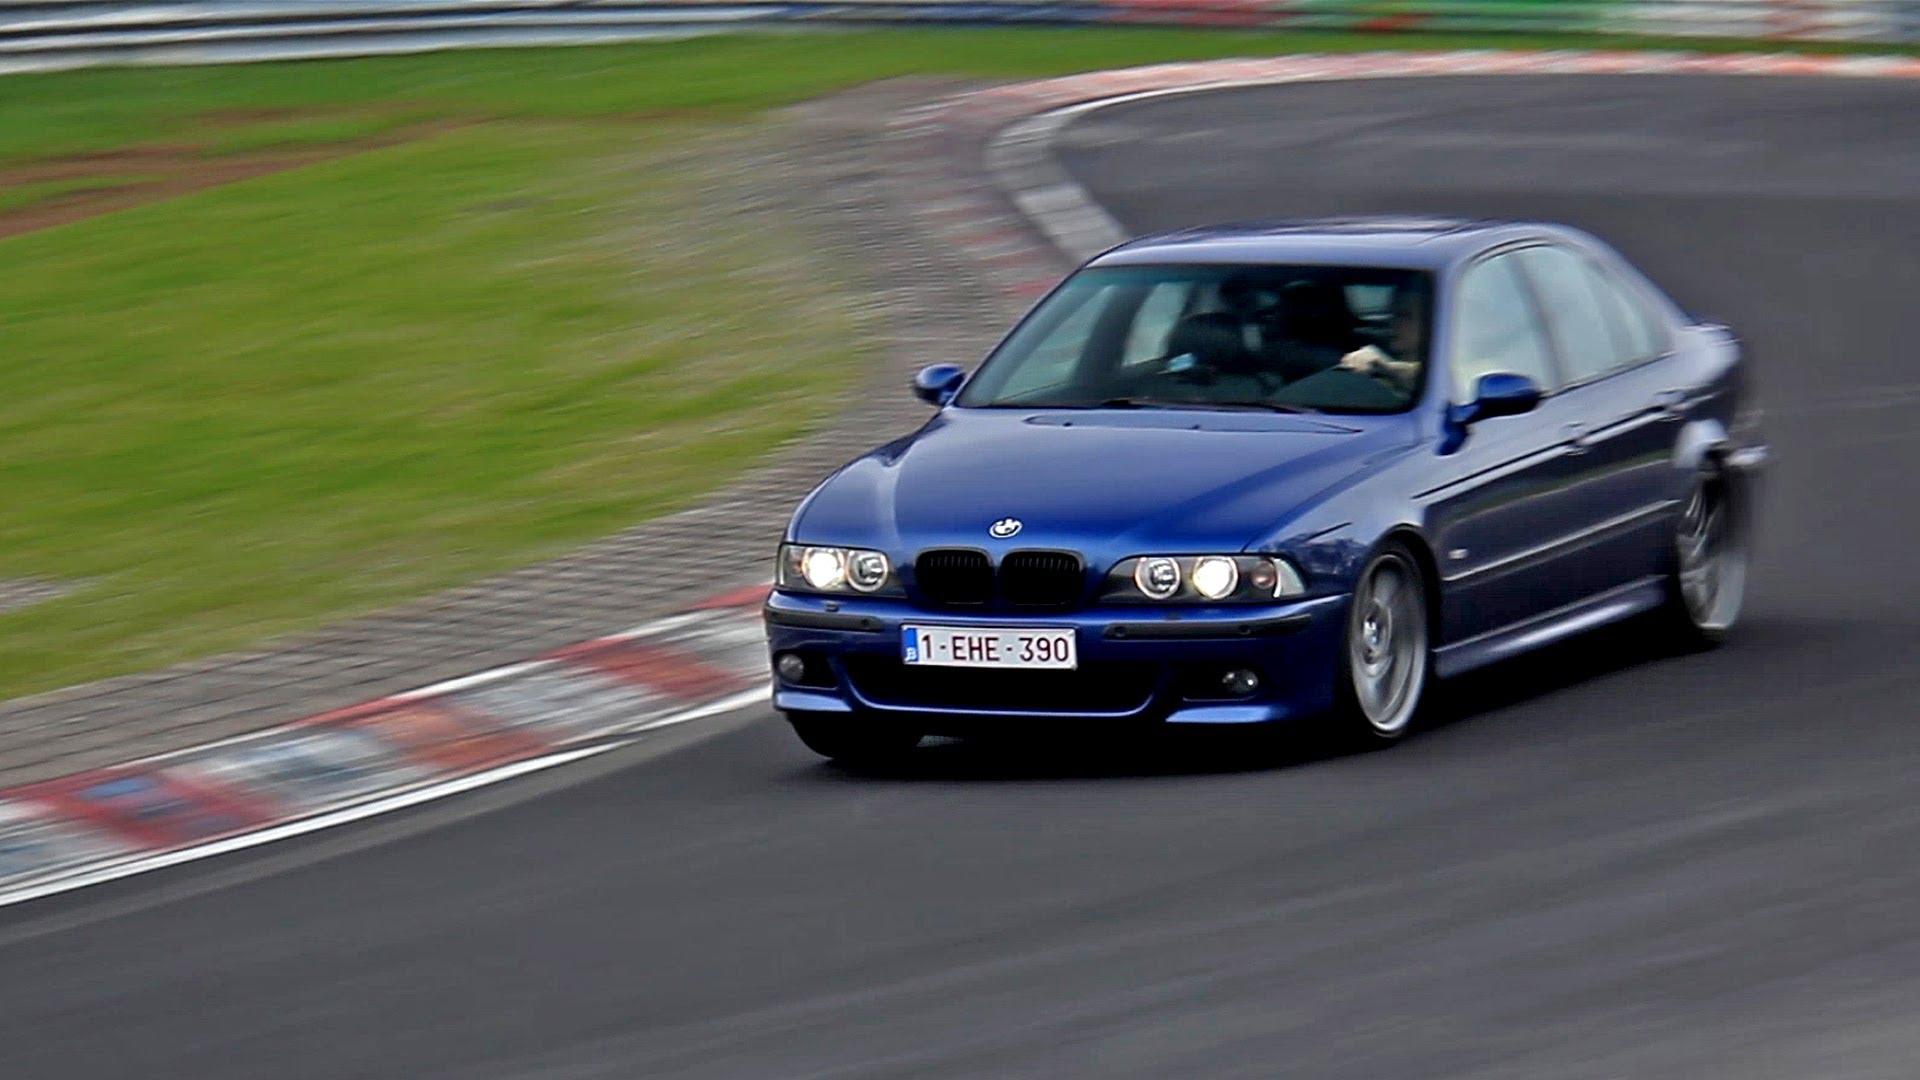 n 06 - Renntage auf dem Nürburgring mit dem BMW CLUB.